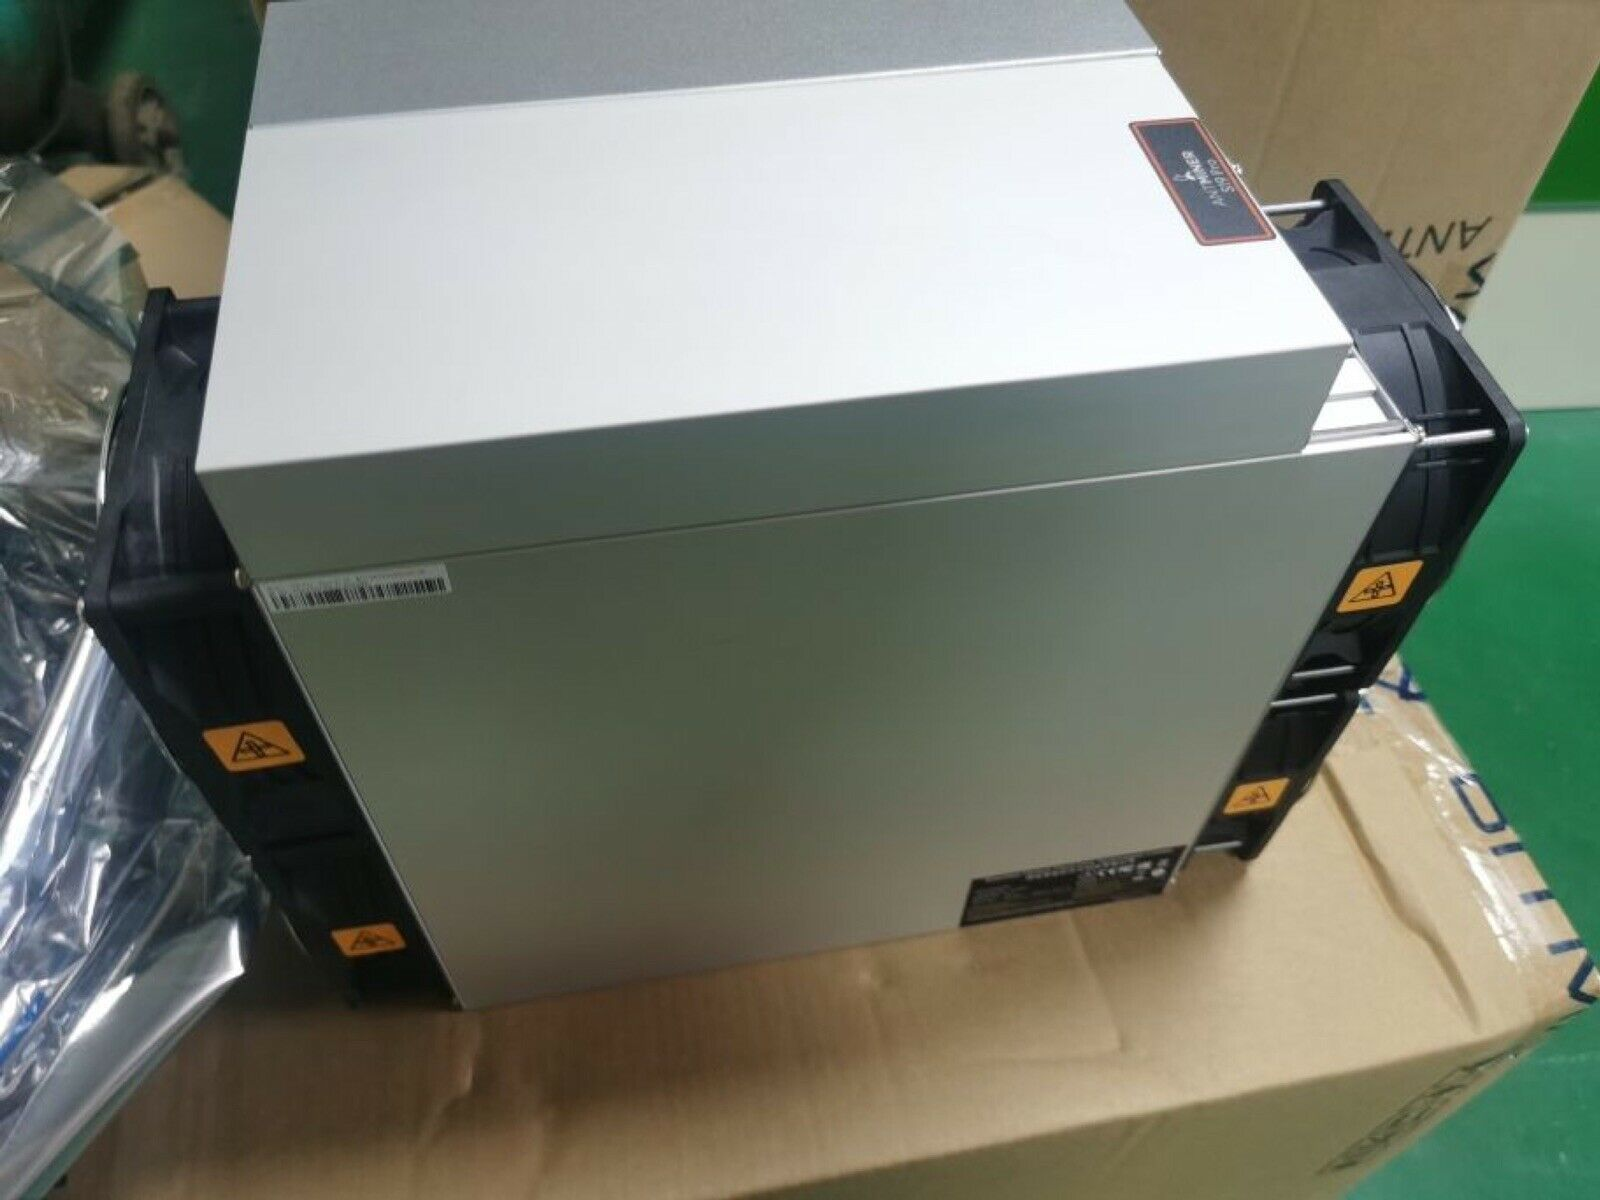 New Antminer Bitmain S19 Pro, Antminer T17+, Nvidia GeForce RTX 3080